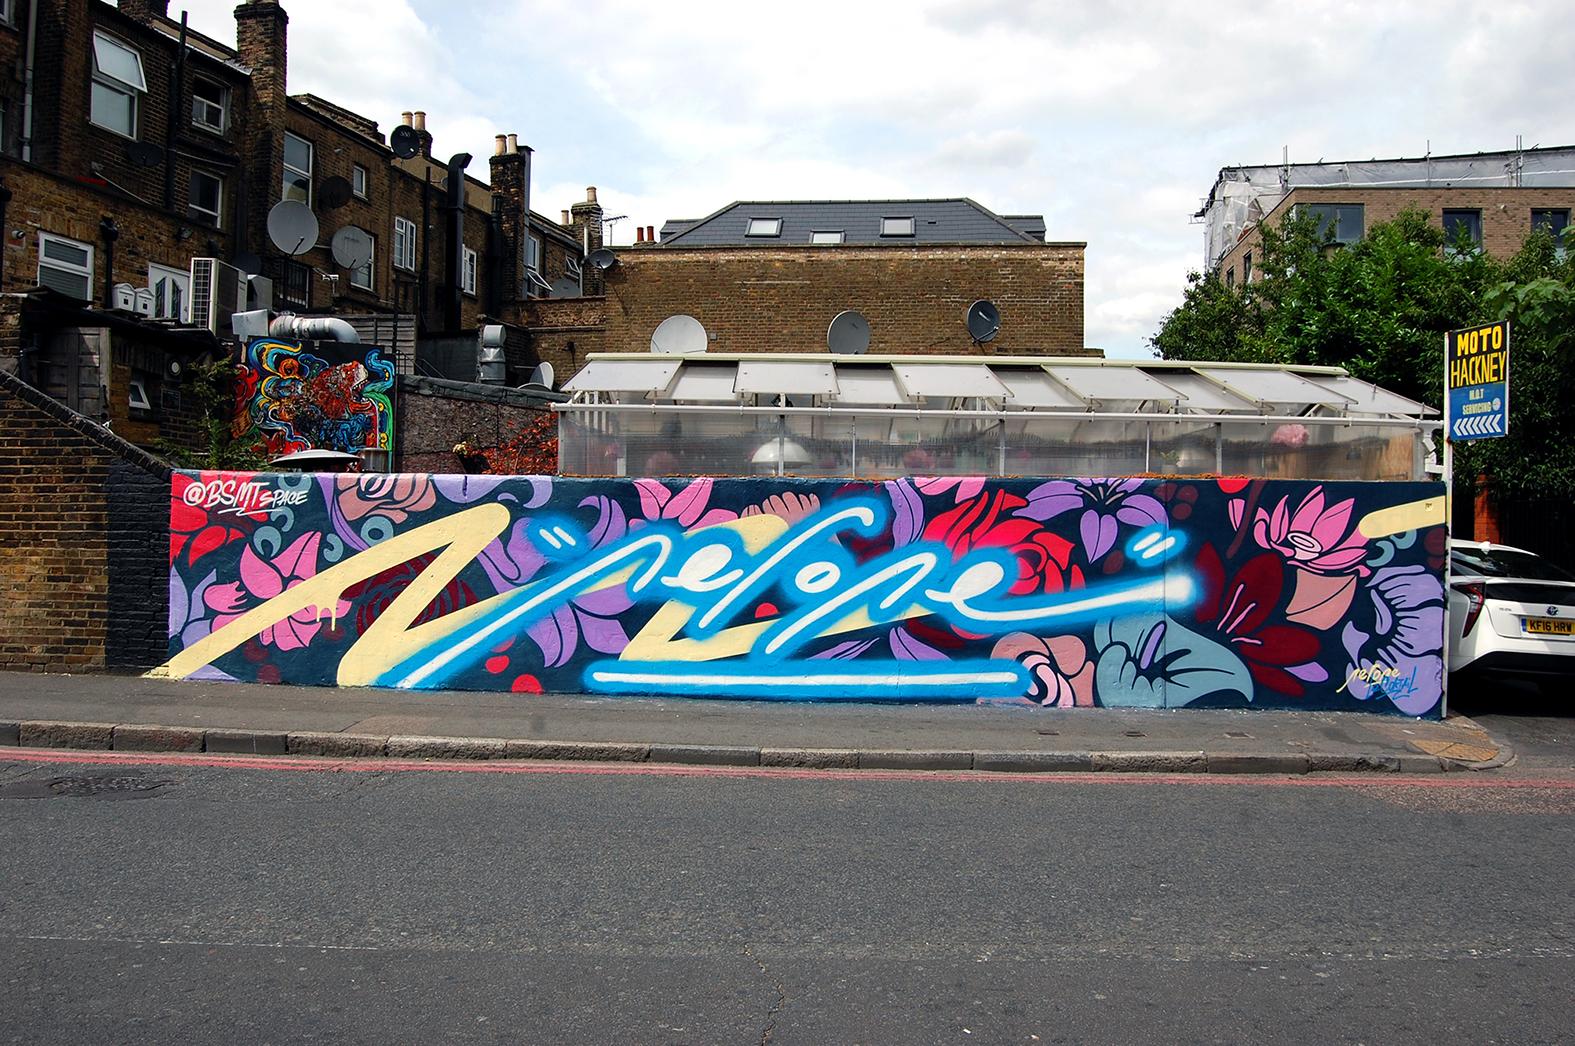 Nerone-BSMT-space-graffiti-3